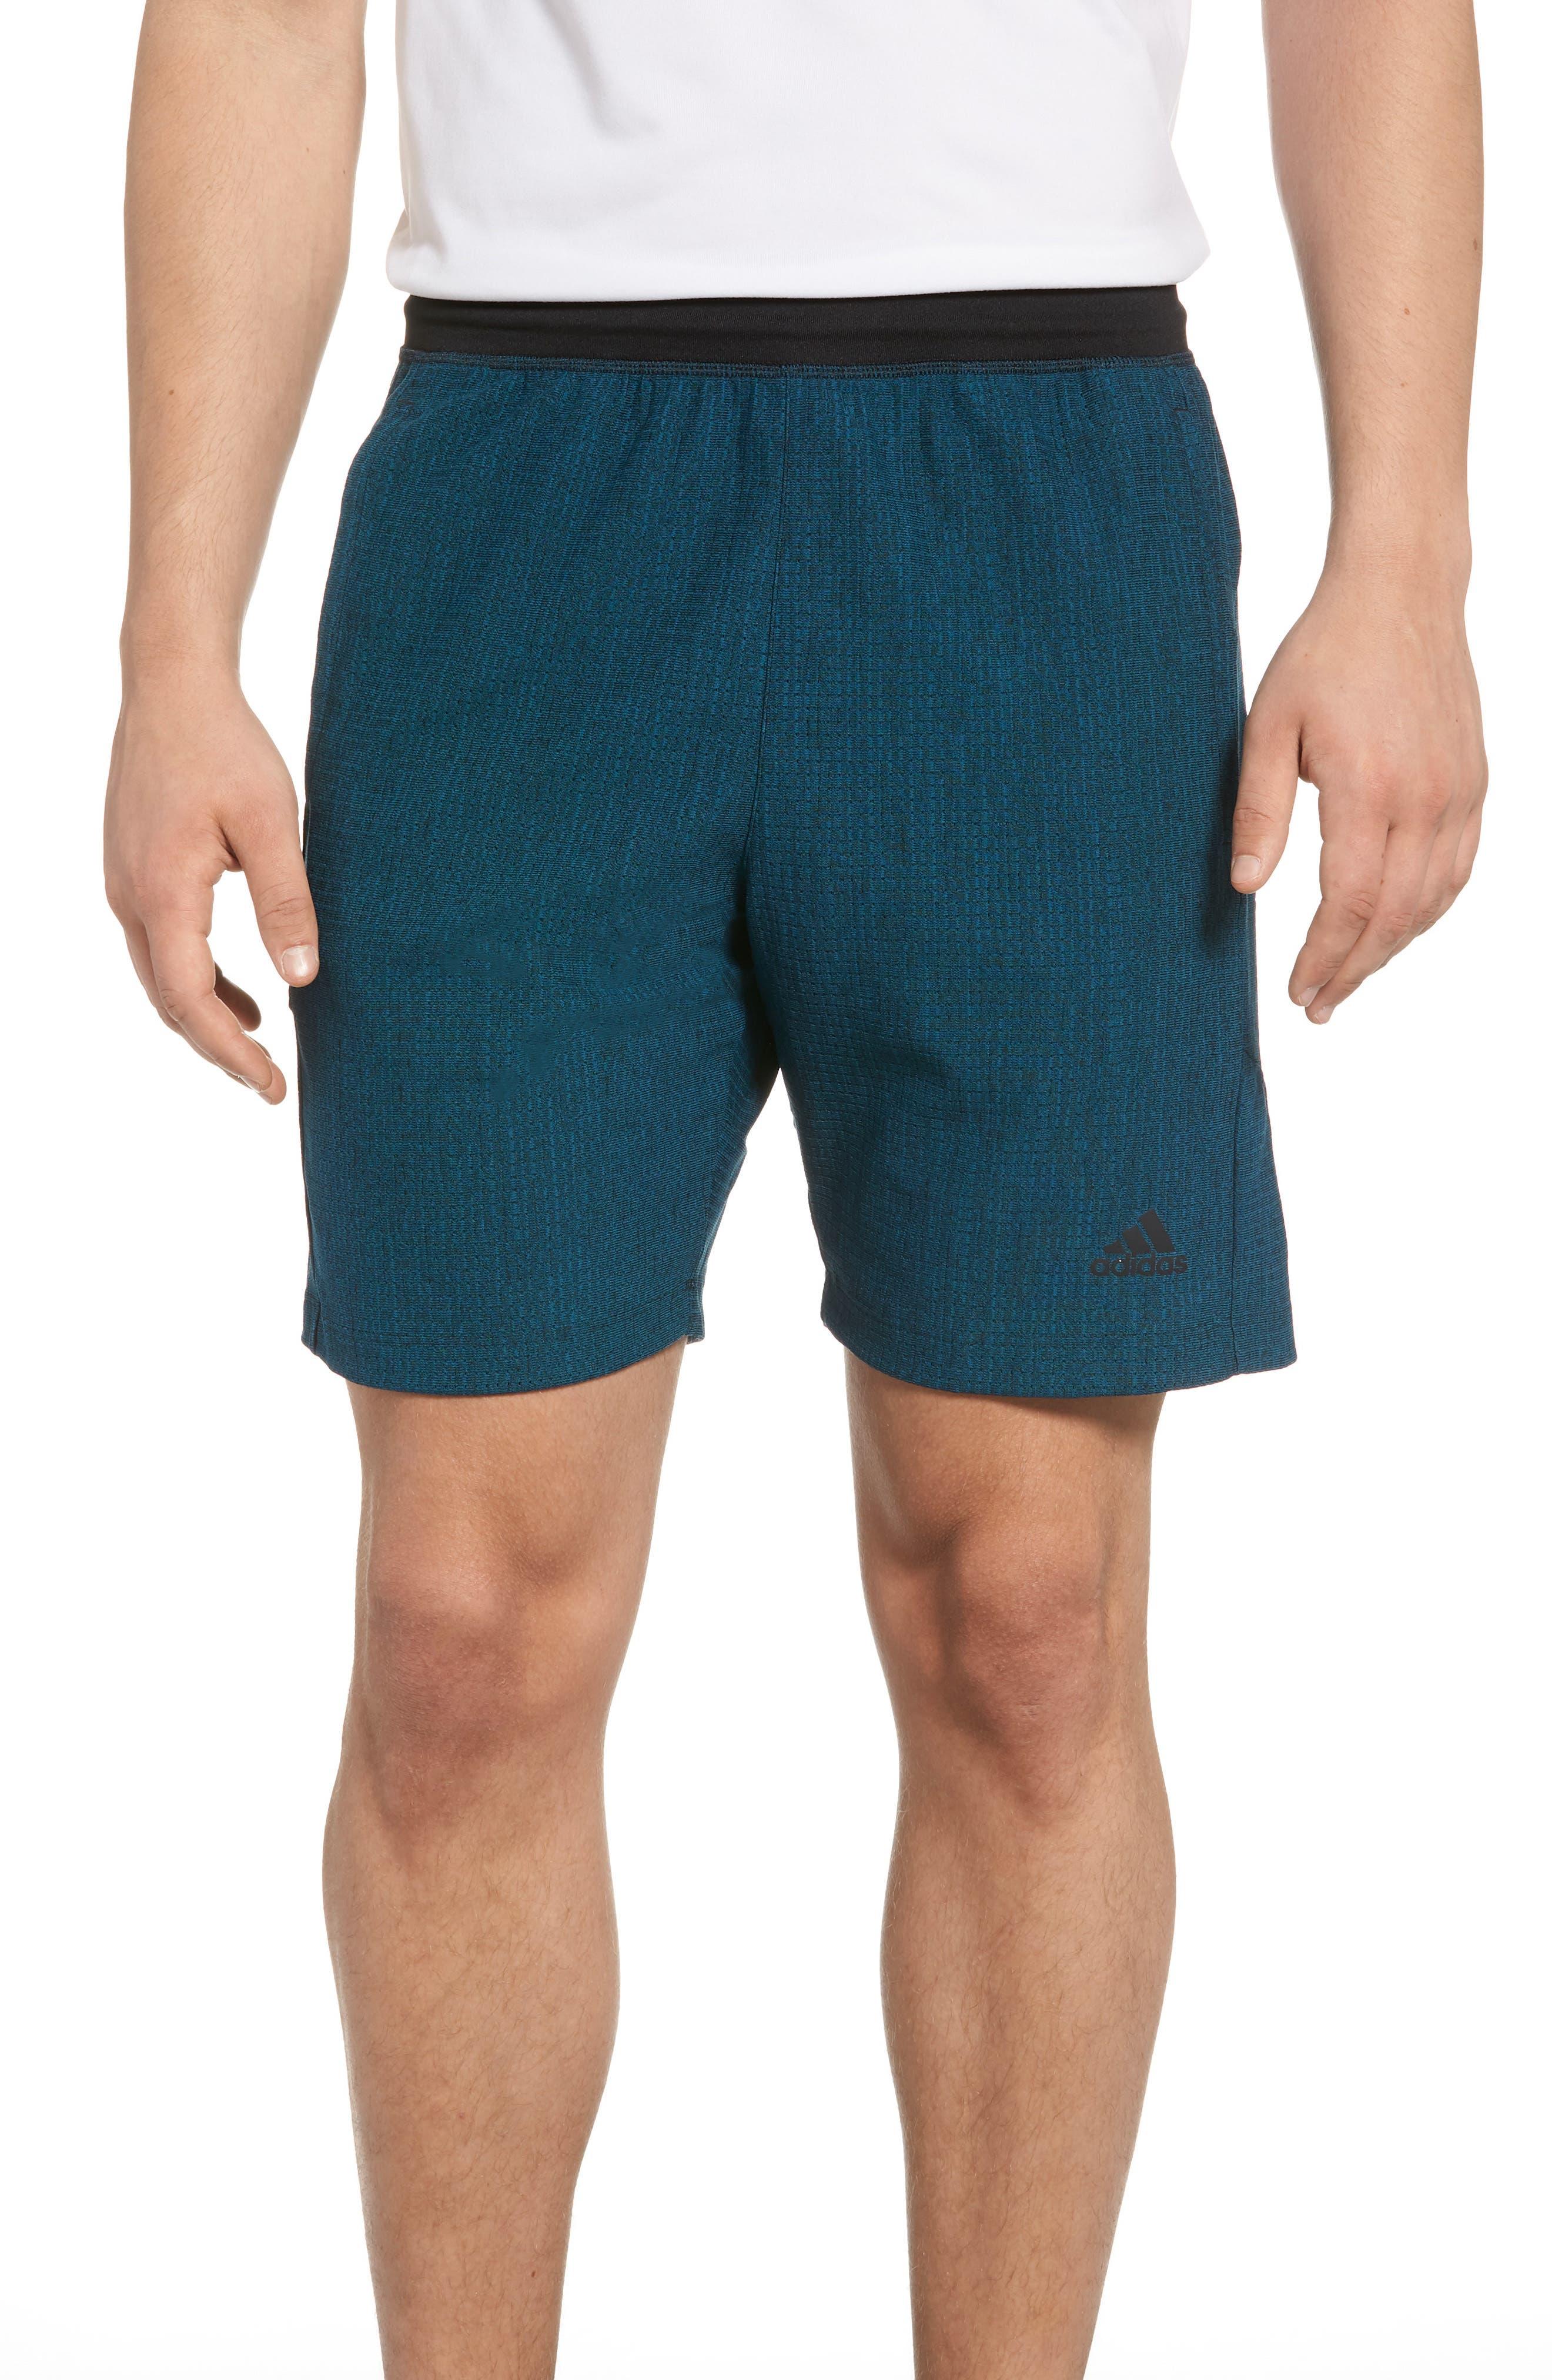 Speedbreaker Shorts,                         Main,                         color, Real Teal